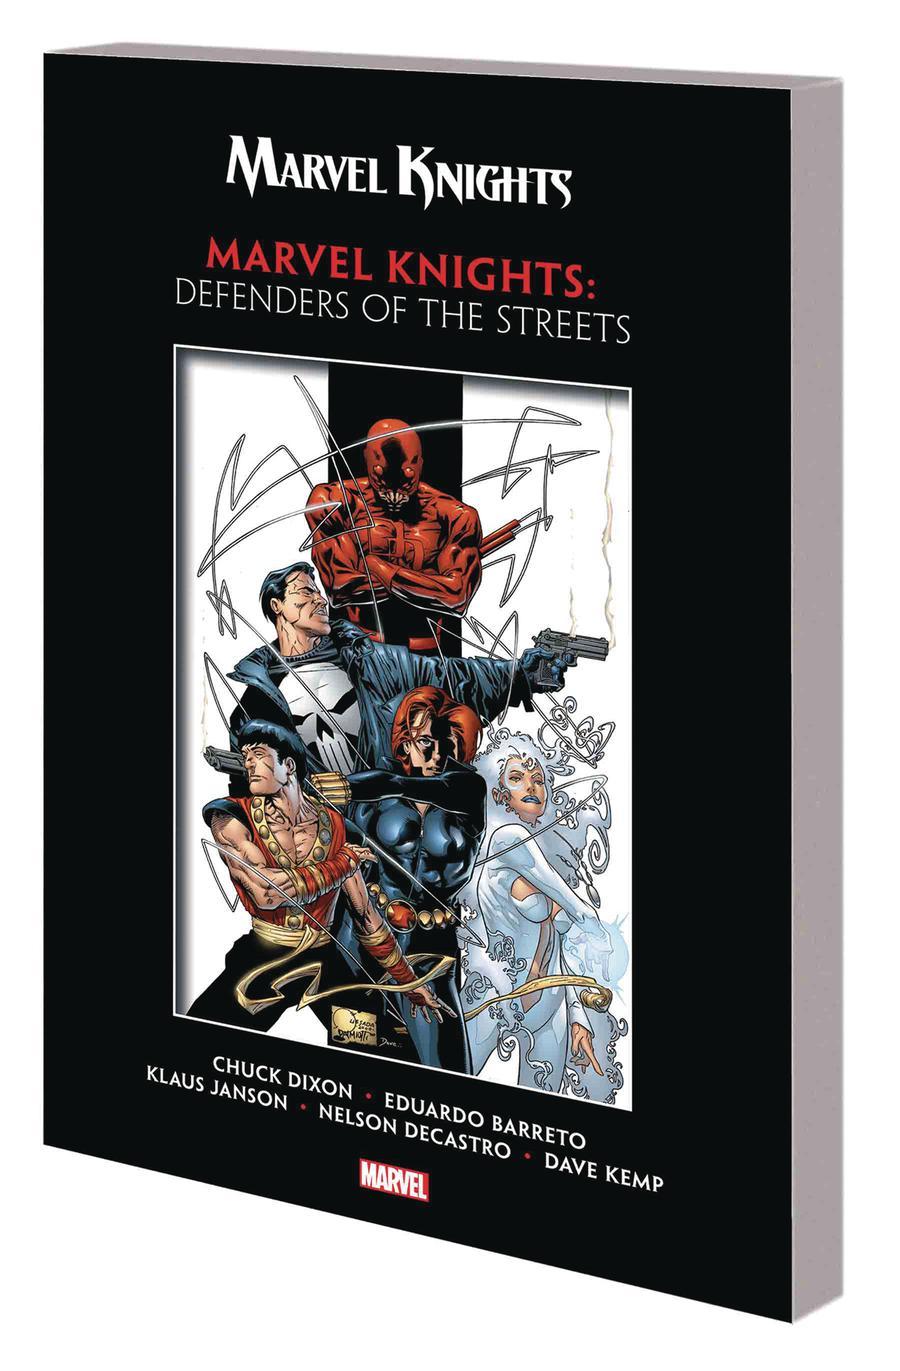 Marvel Knights By Chuck Dixon & Eduardo Barreto Defenders Of The Streets TP